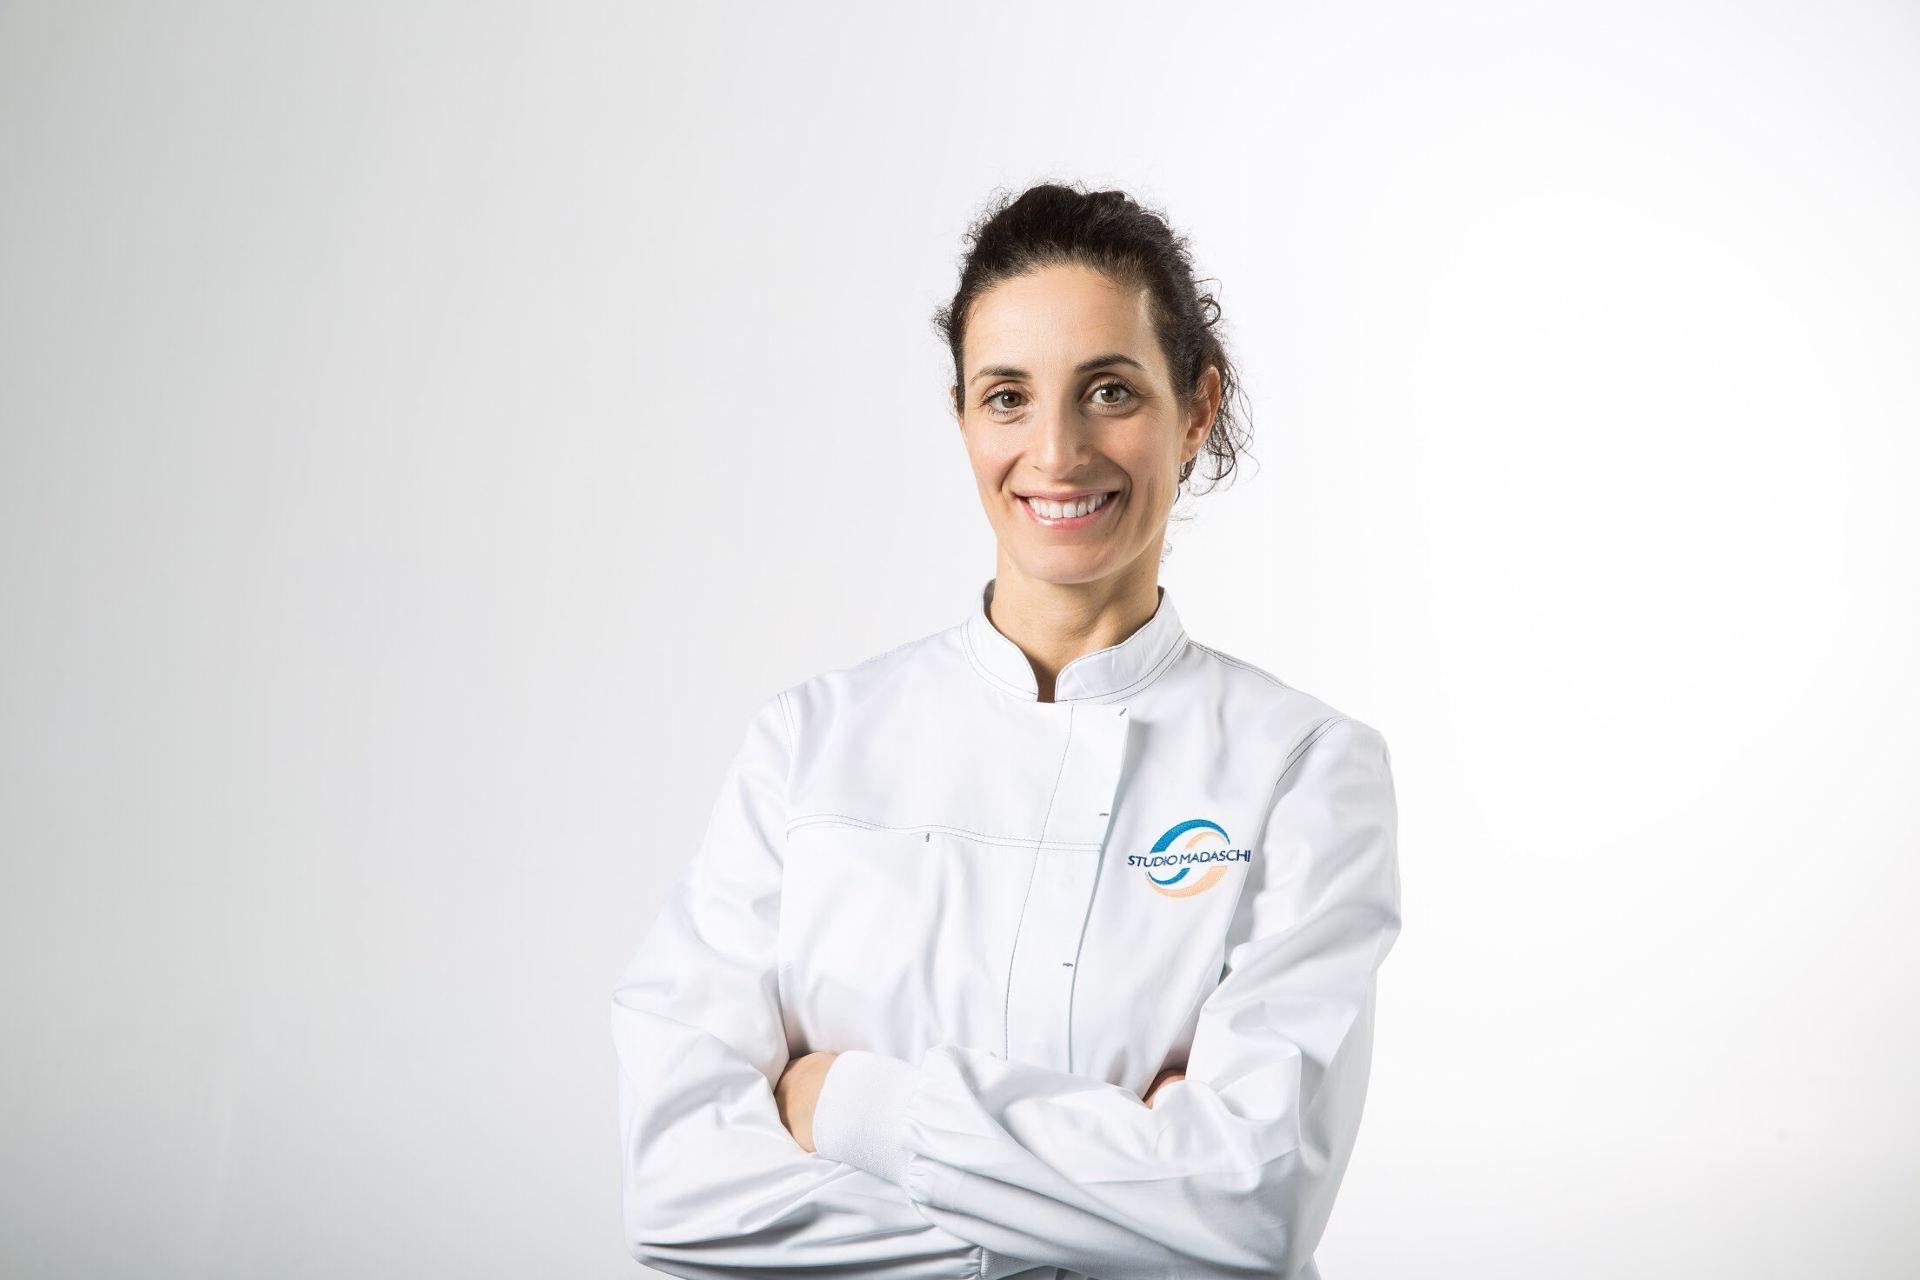 Lidia Bortolotti